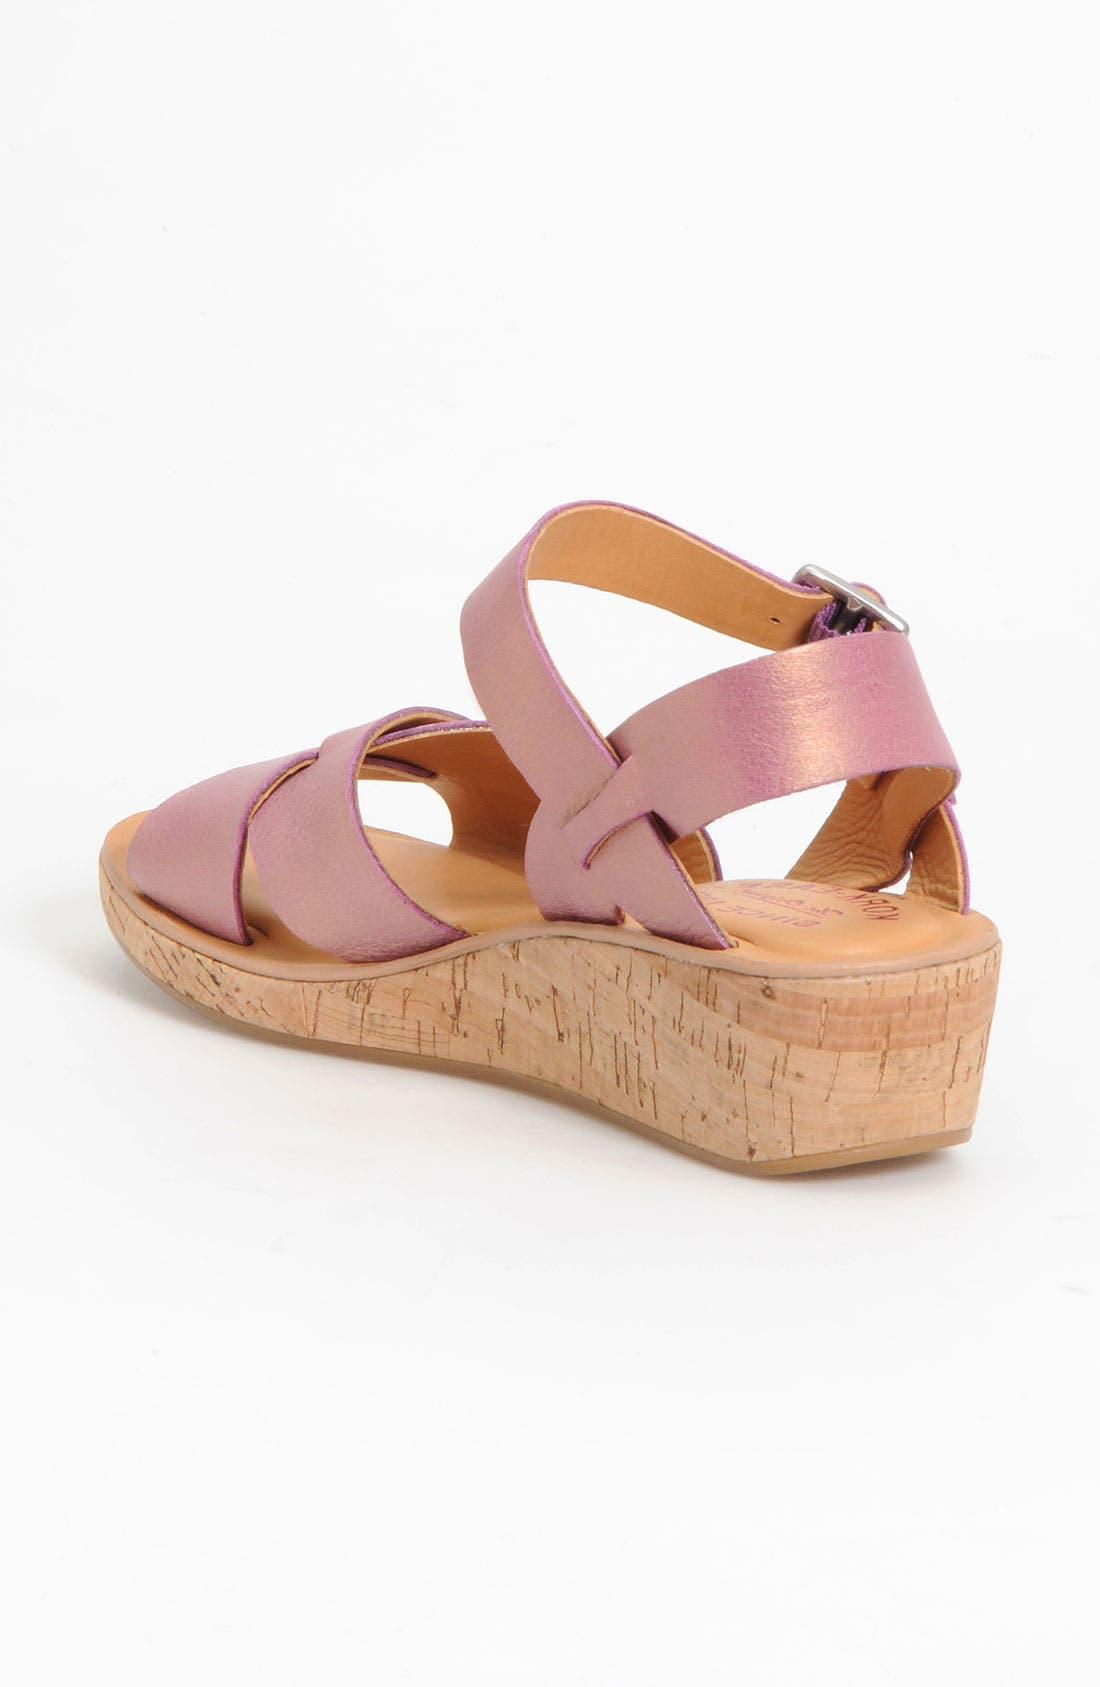 KORK-EASE<SUP>®</SUP>, Kork-Ease 'Myrna' Sandal, Alternate thumbnail 3, color, 500